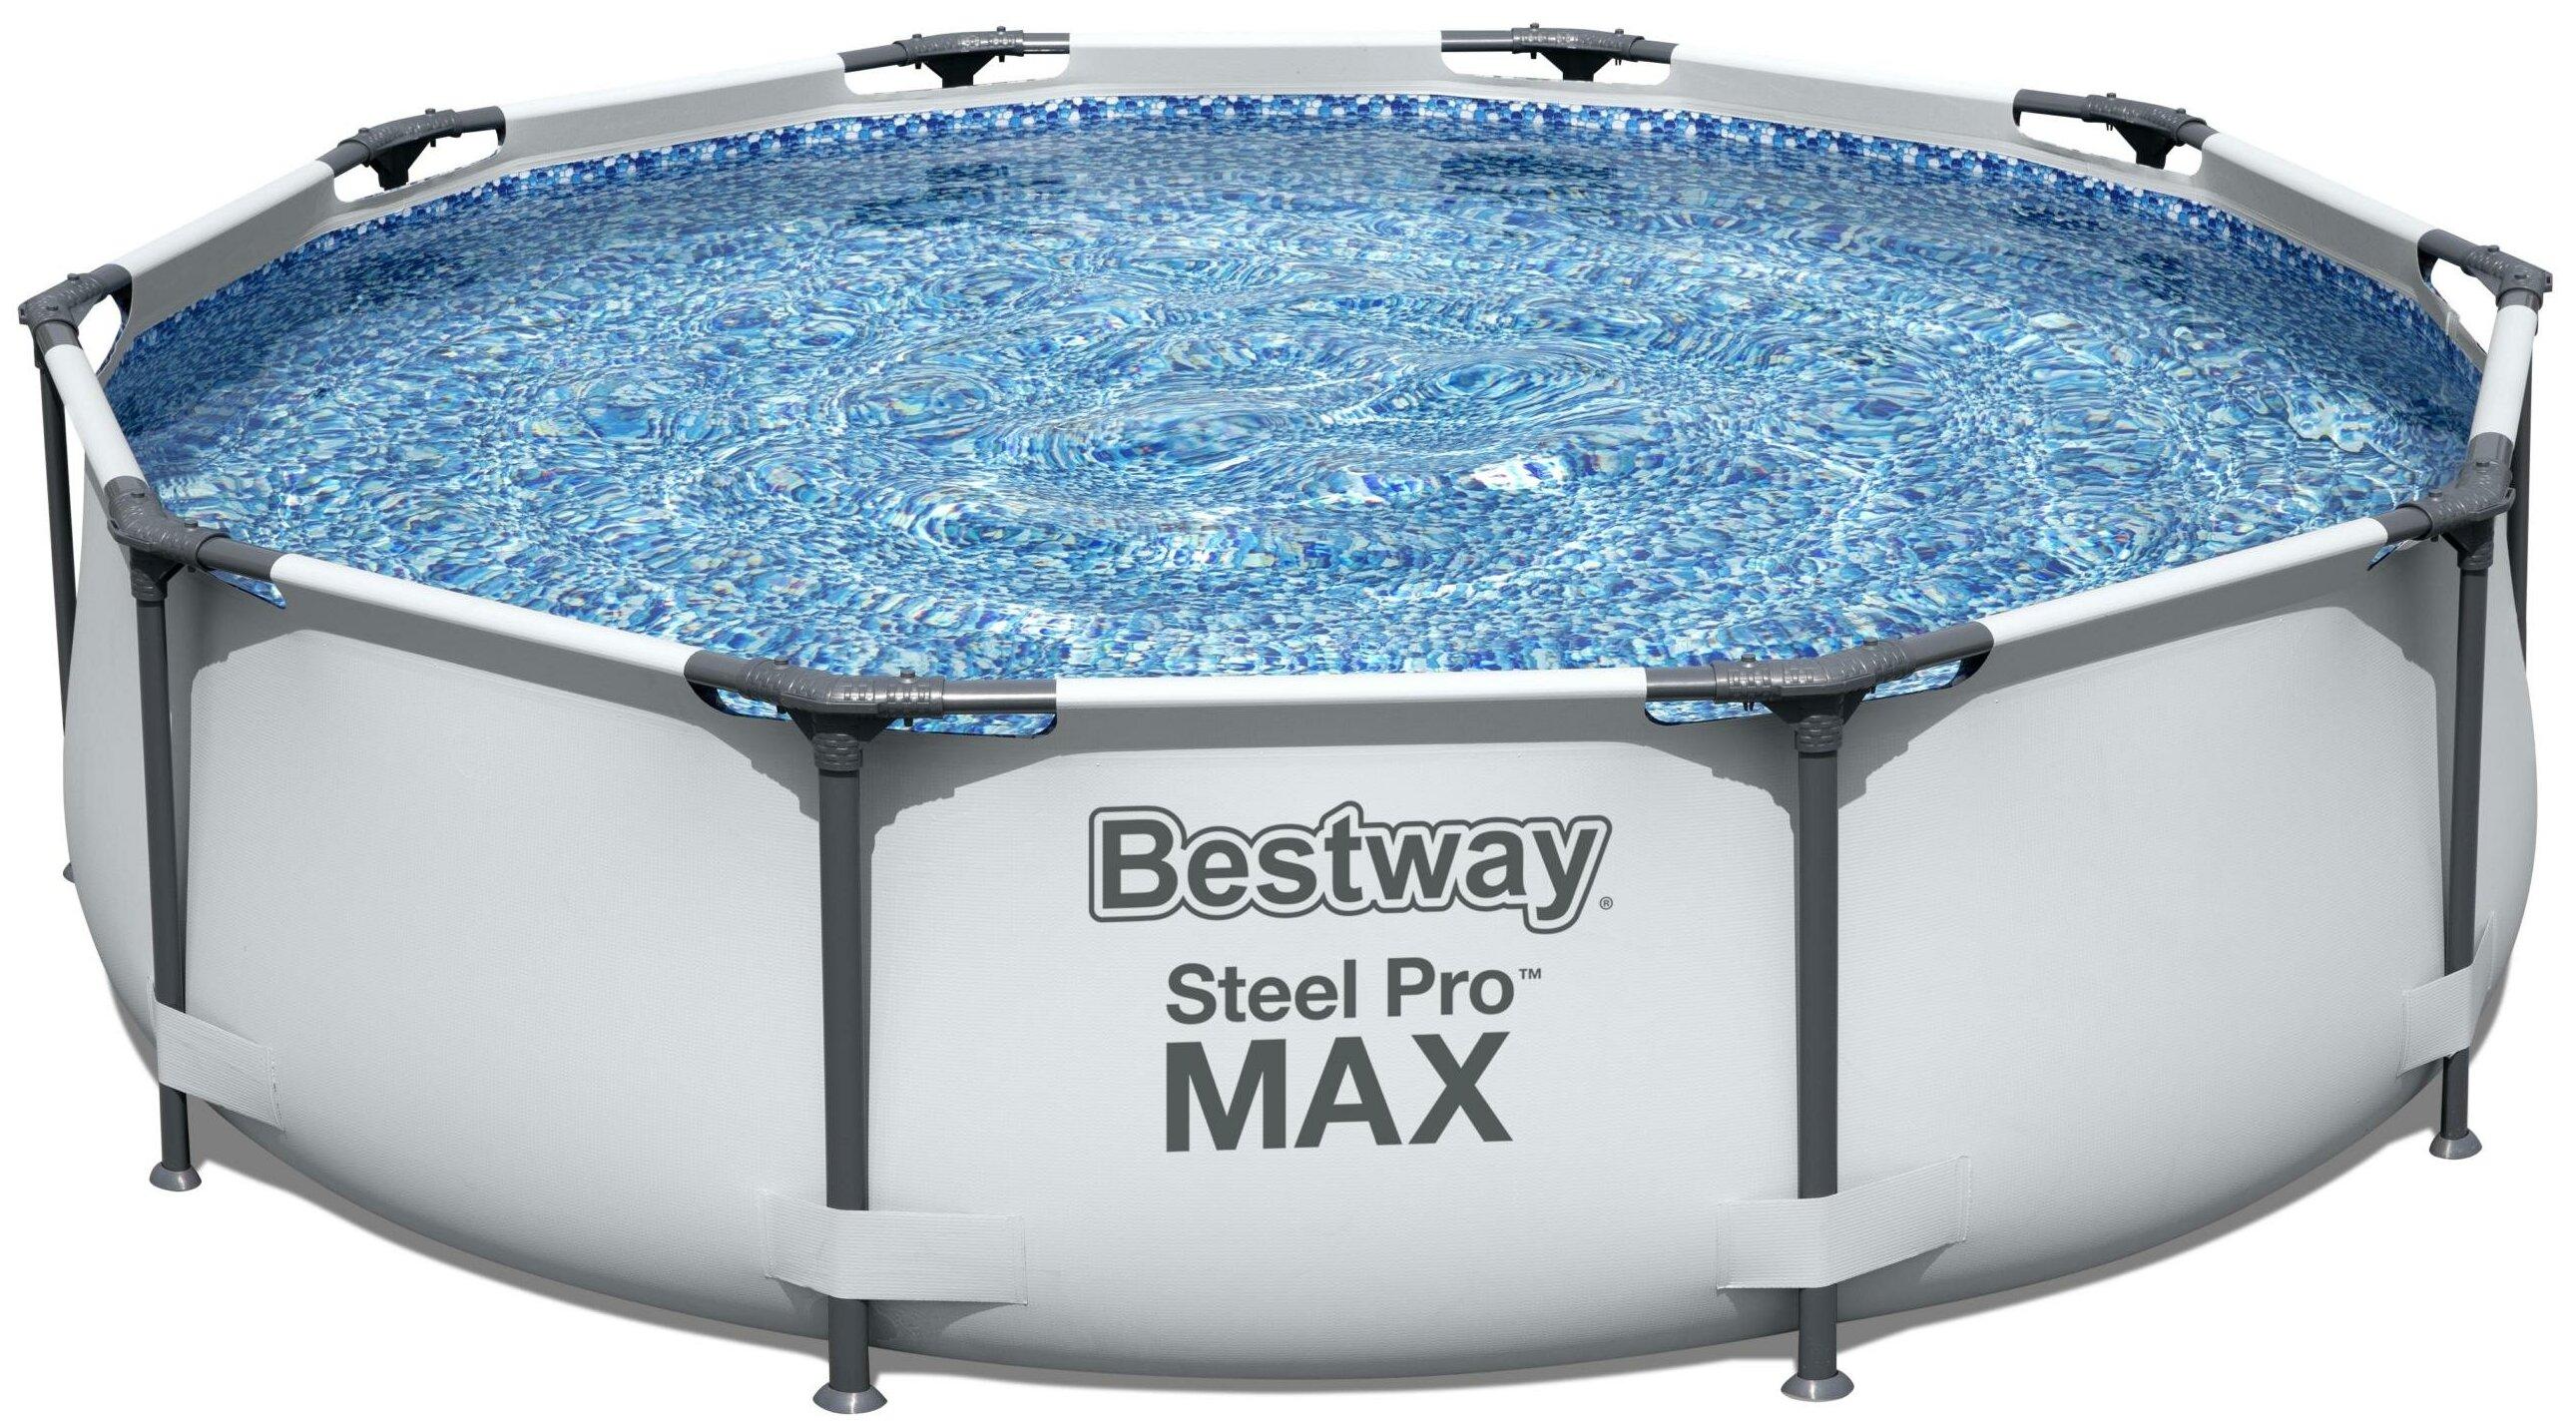 Бассейн Bestway Steel Pro MAX 56059/56408